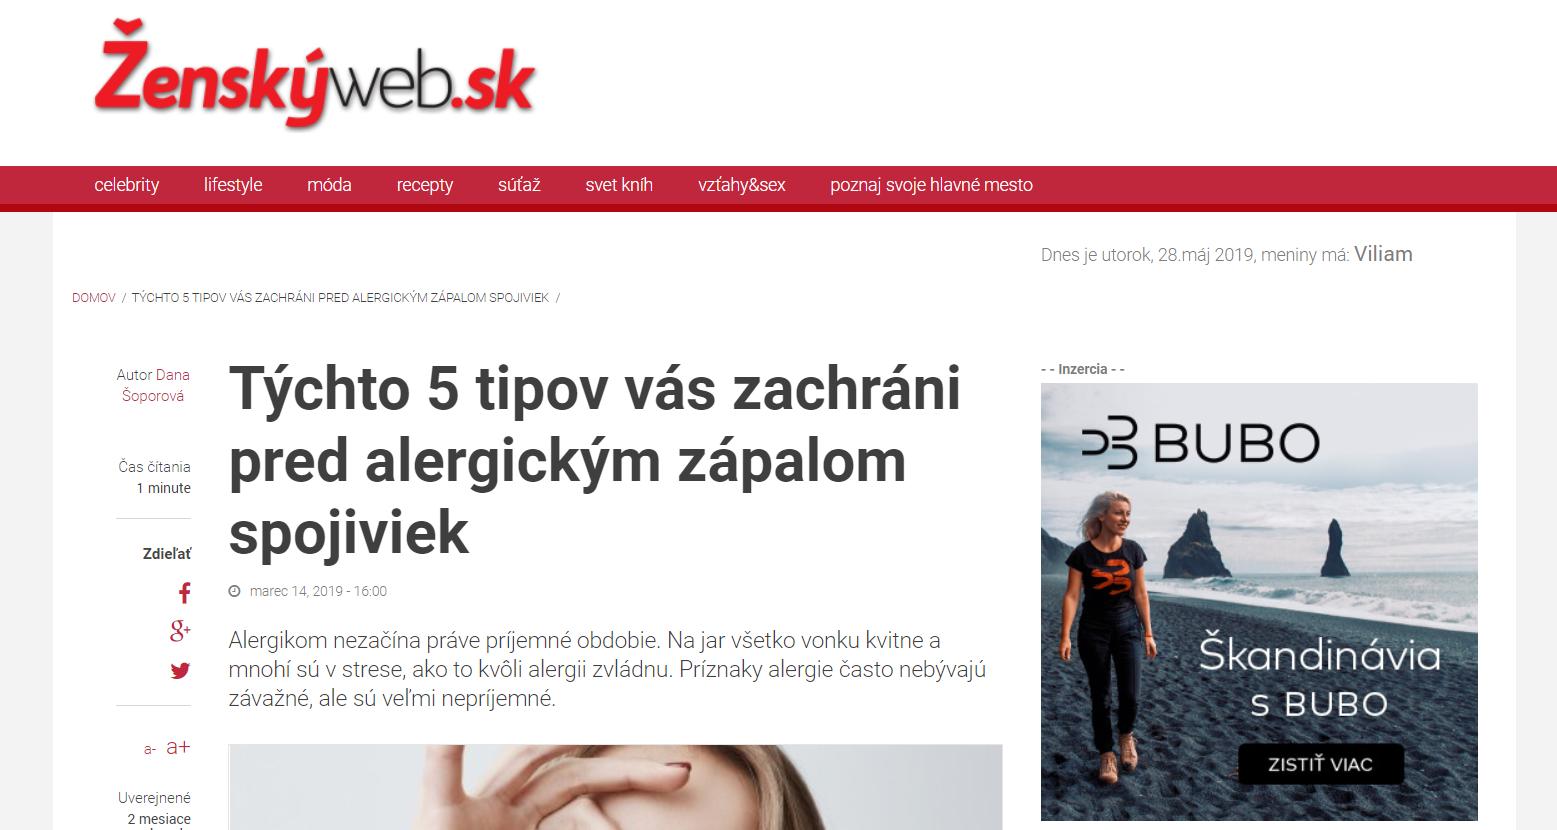 zenskyweb